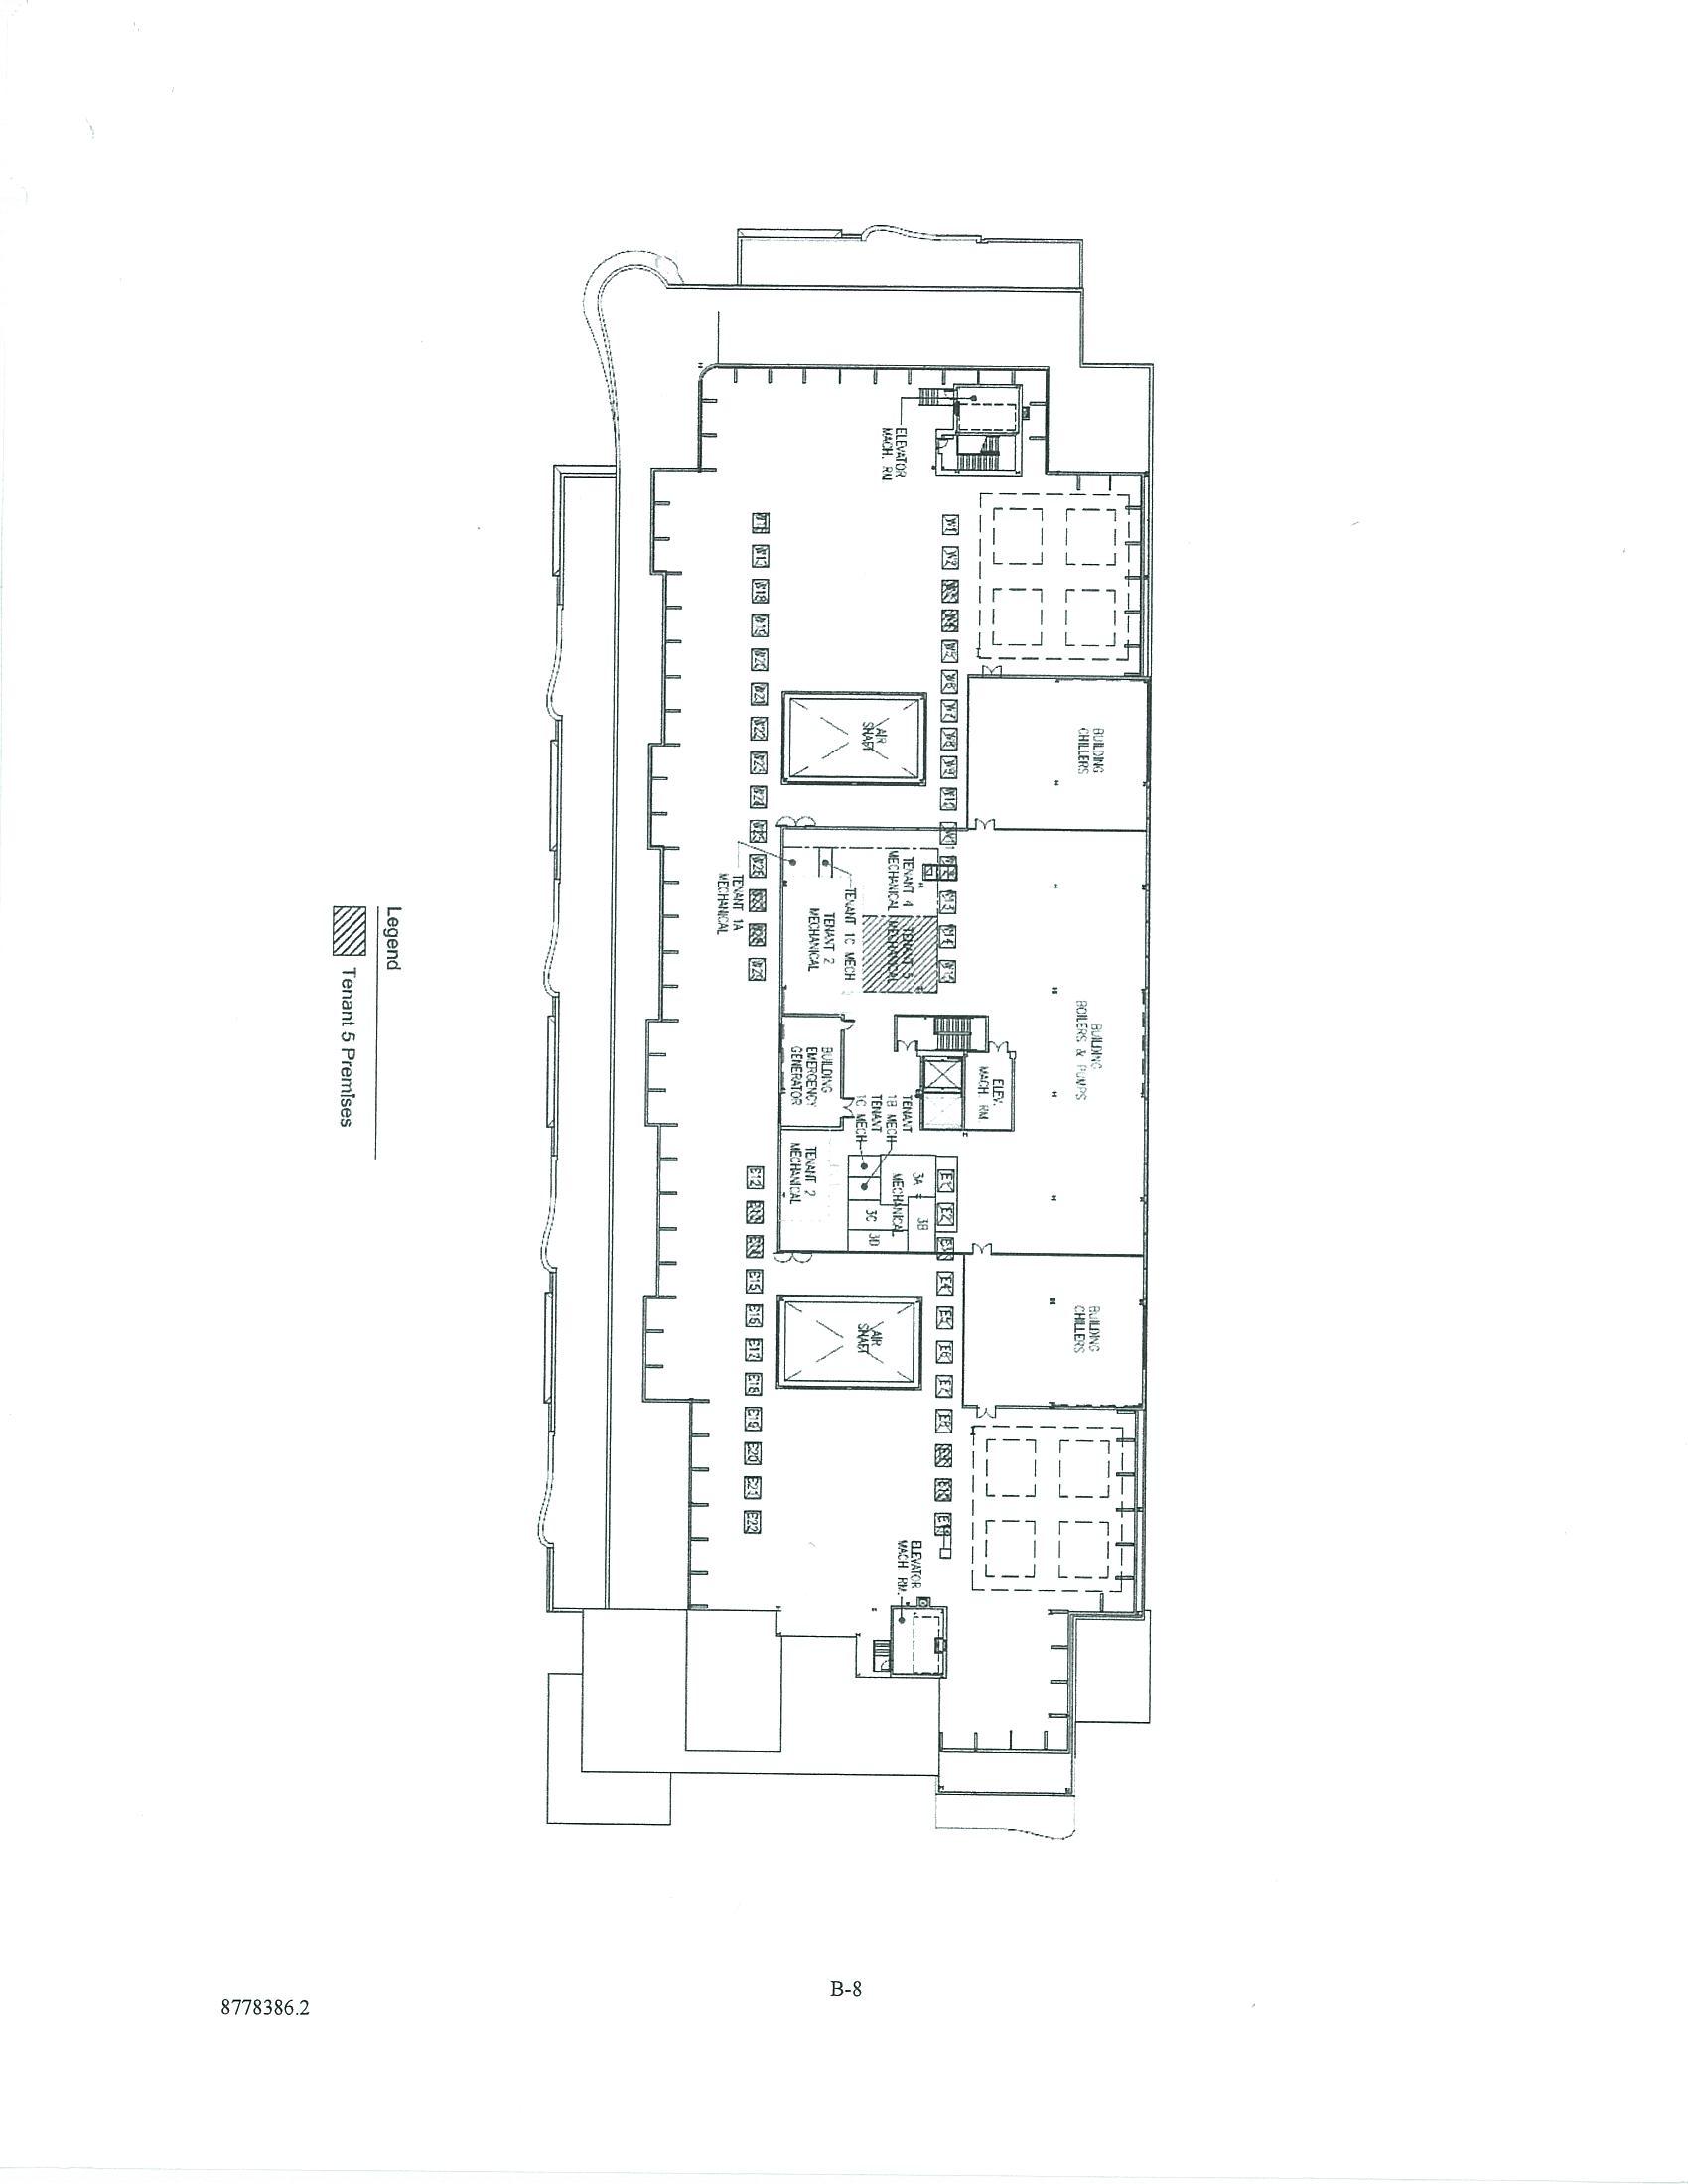 Landlord Estoppel Certificate